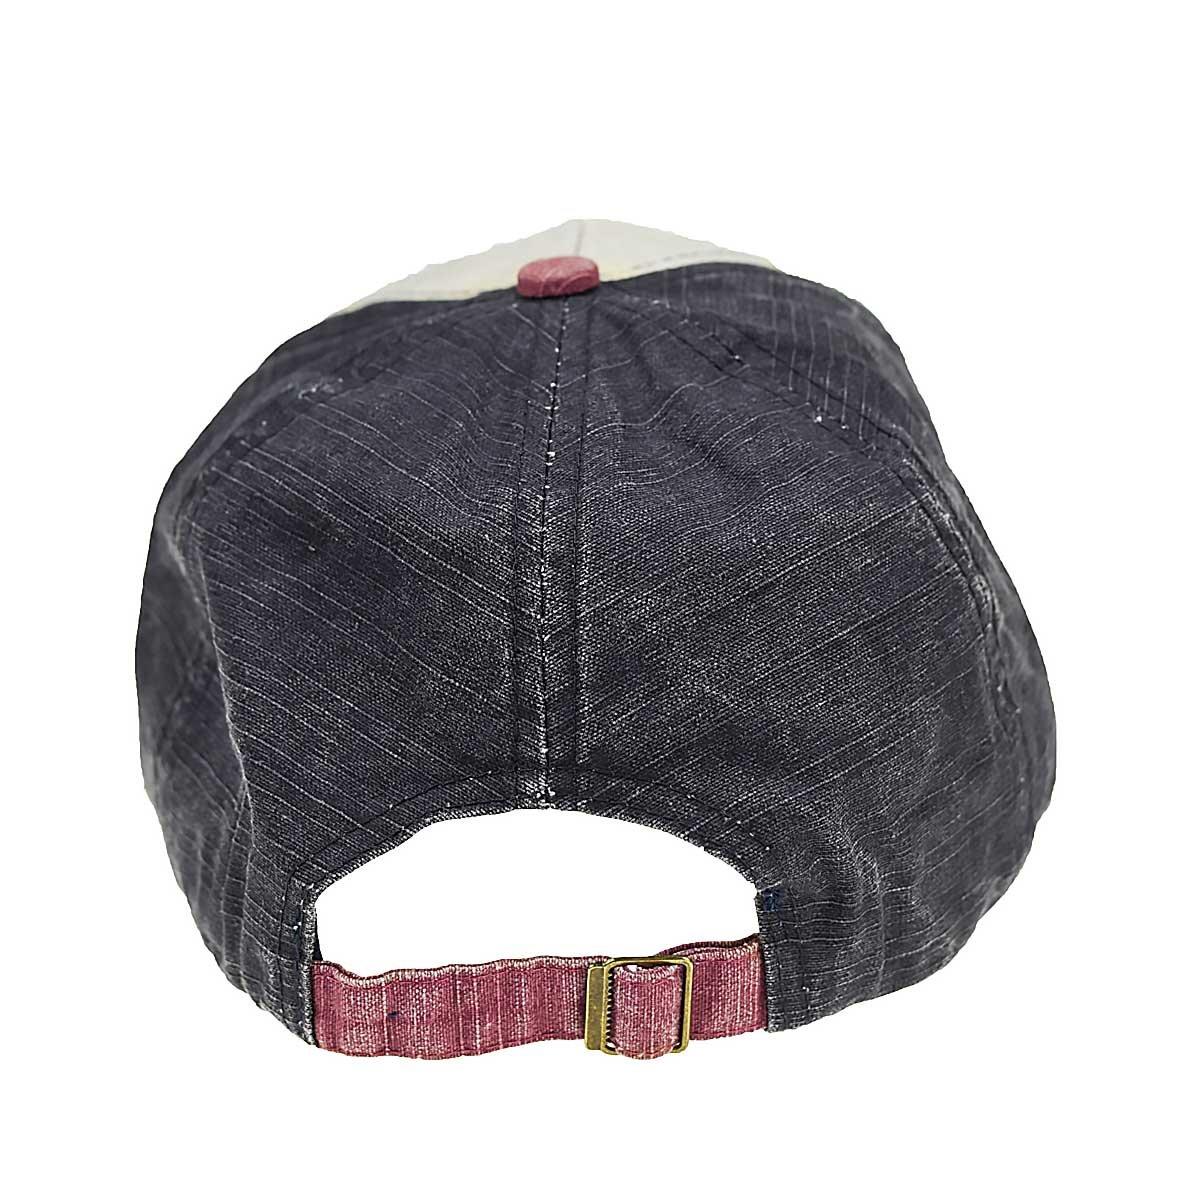 03a23df3dd8 Yusongirl Vintage Washed Denim Baseball Cap Cotton Dad Hat Adjustable Size  Unisex